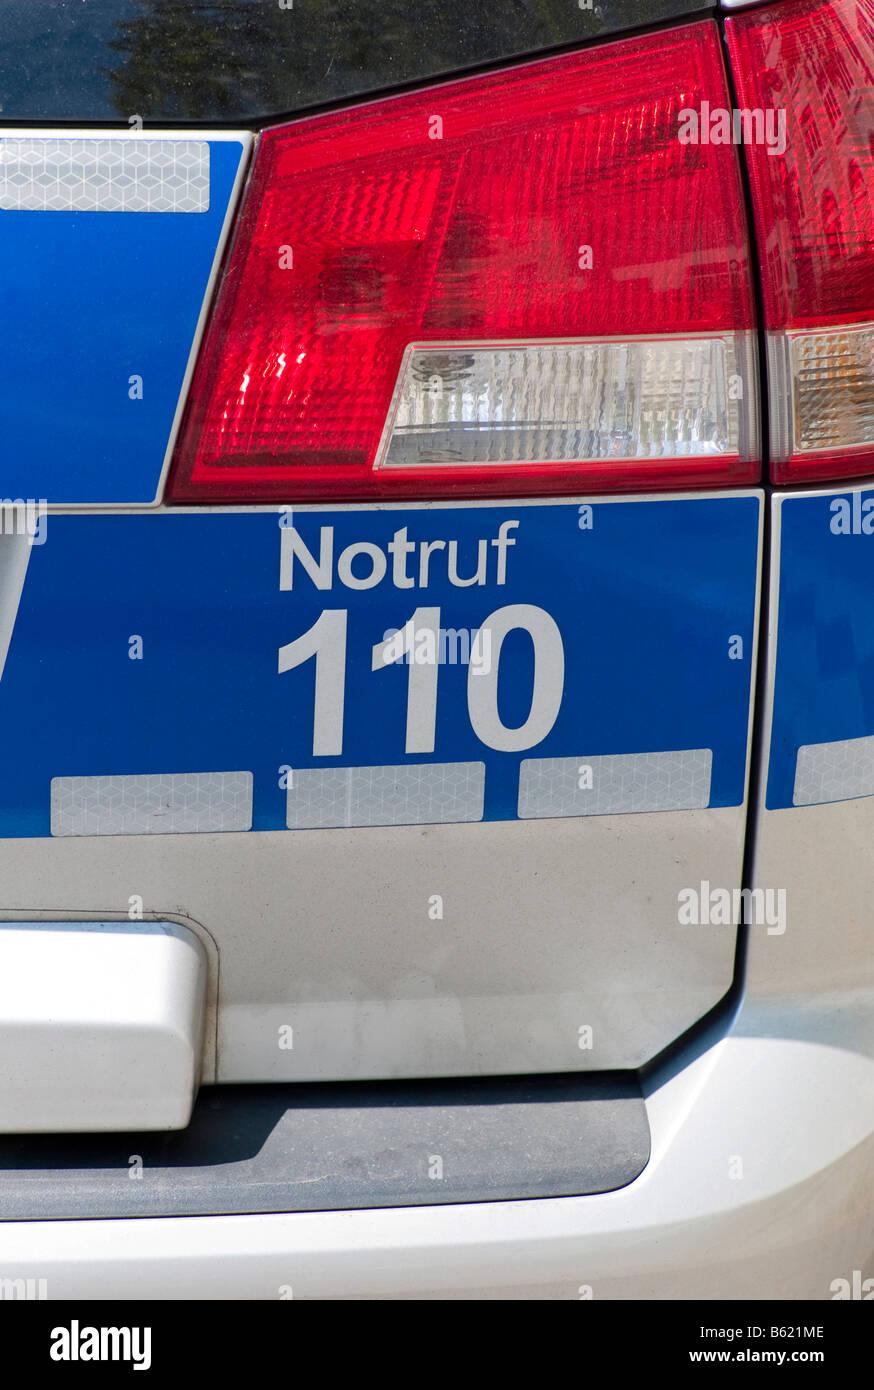 Polizeiautos, Rückansicht, Detail, Deutschland, Europa Stockbild